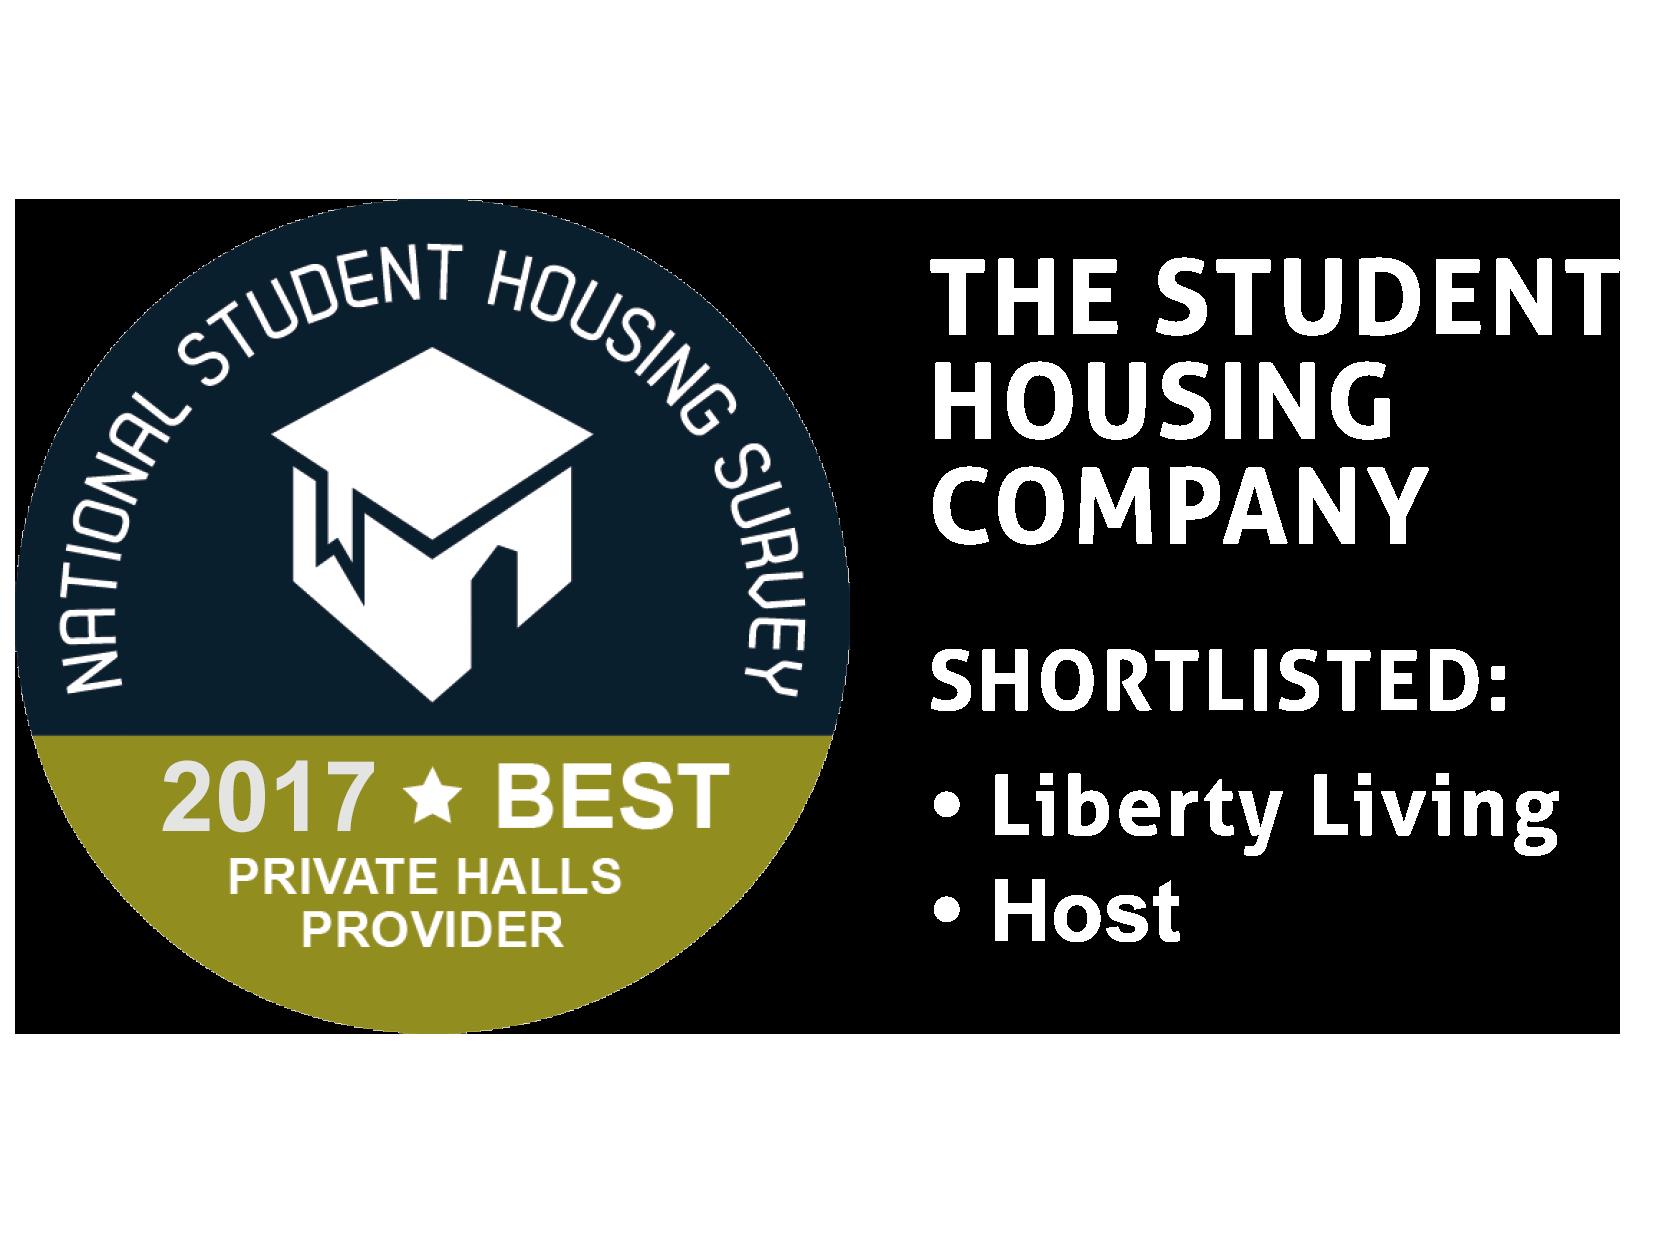 National Student Housing Survey - Best Private Halls Provider